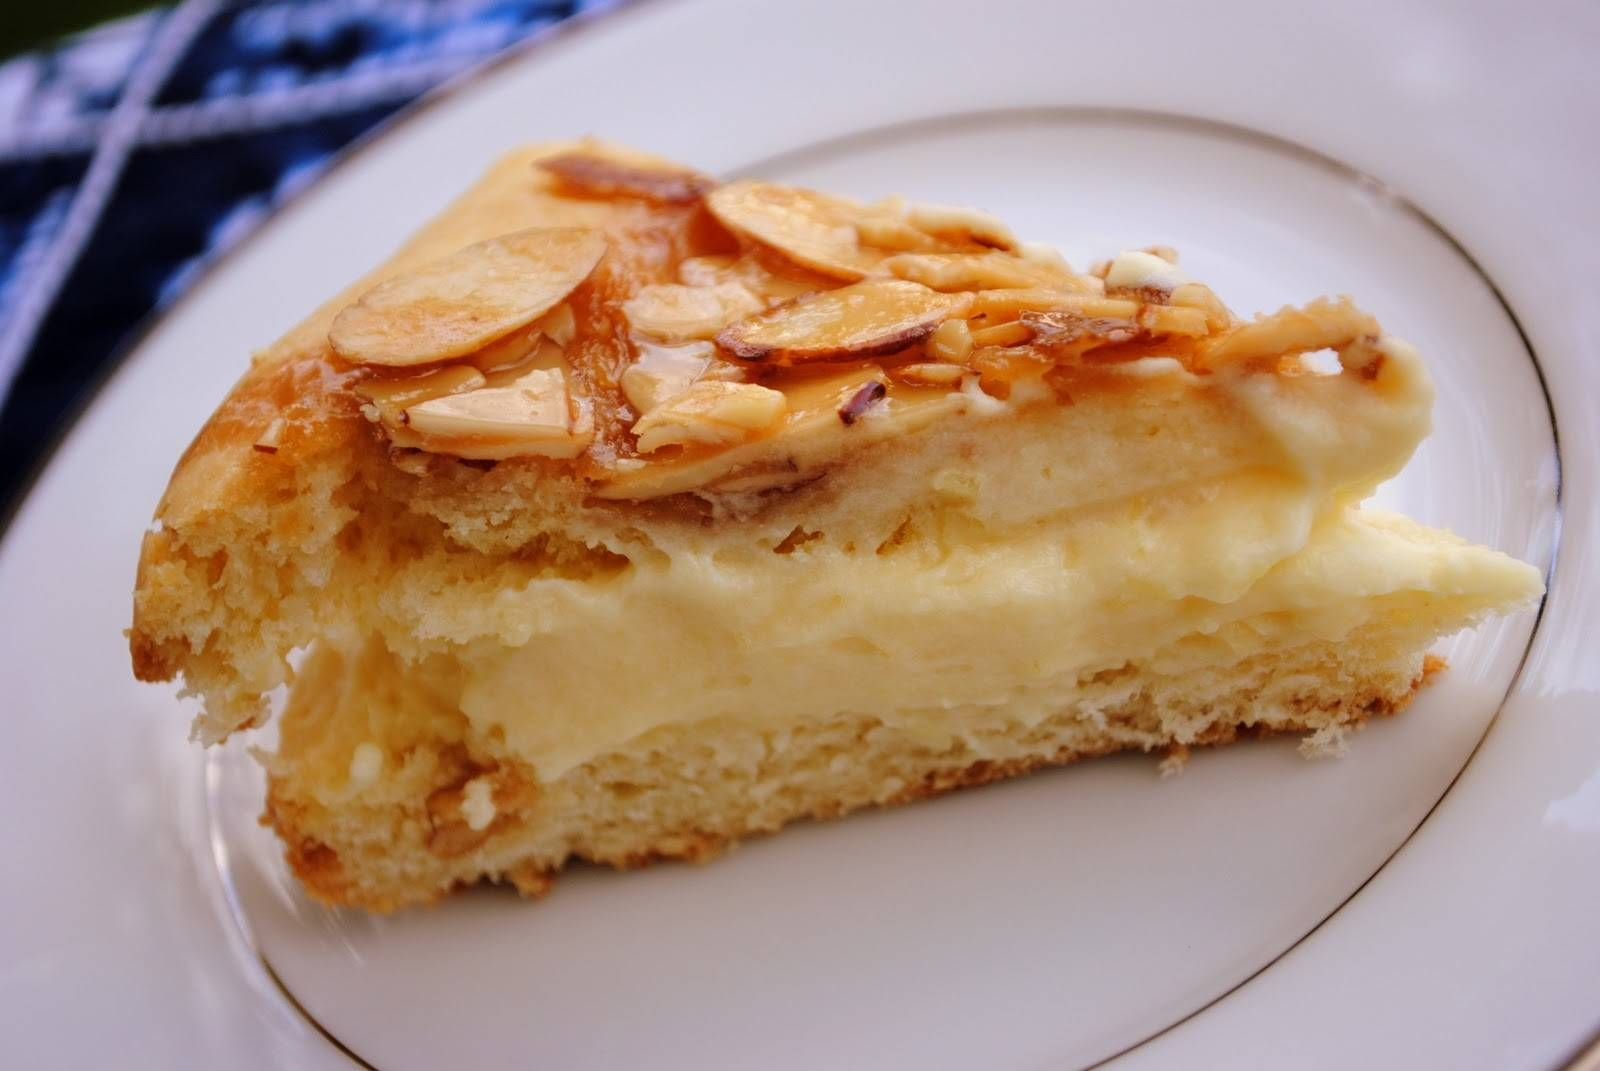 маленькими торт укус пчелы рецепт с фото караганды прославилась счет